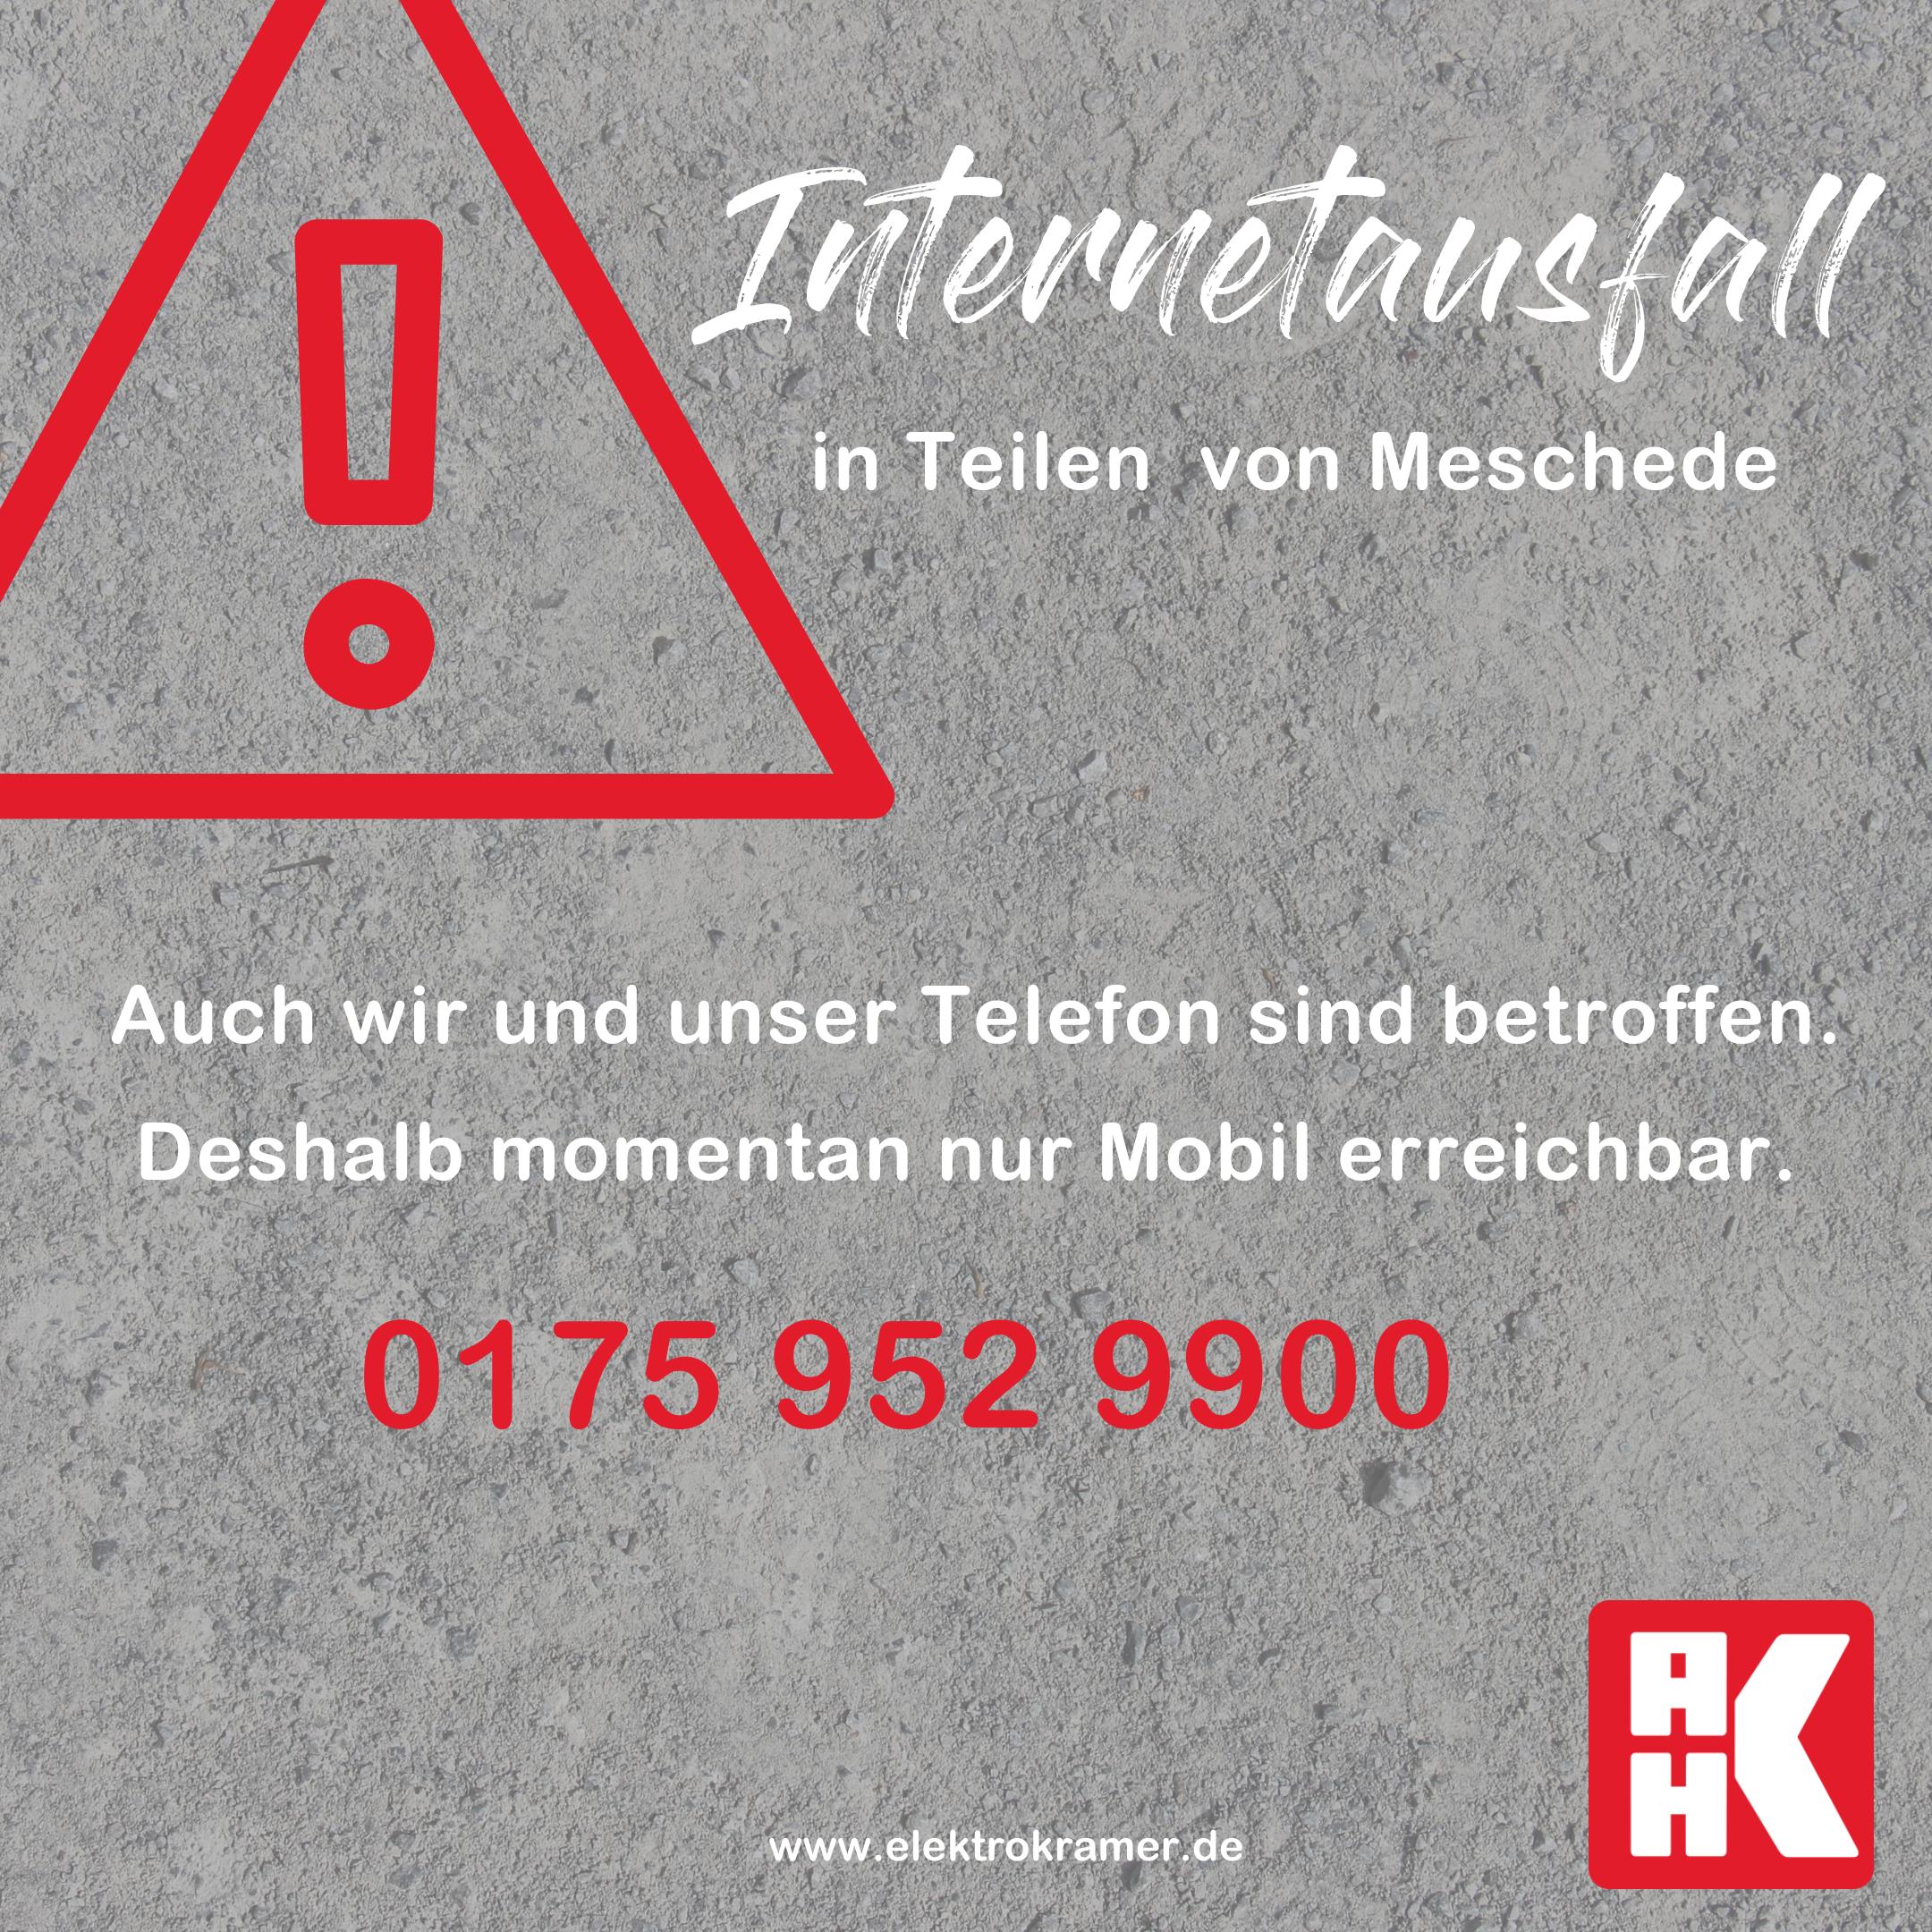 Internetausfall in Meschede